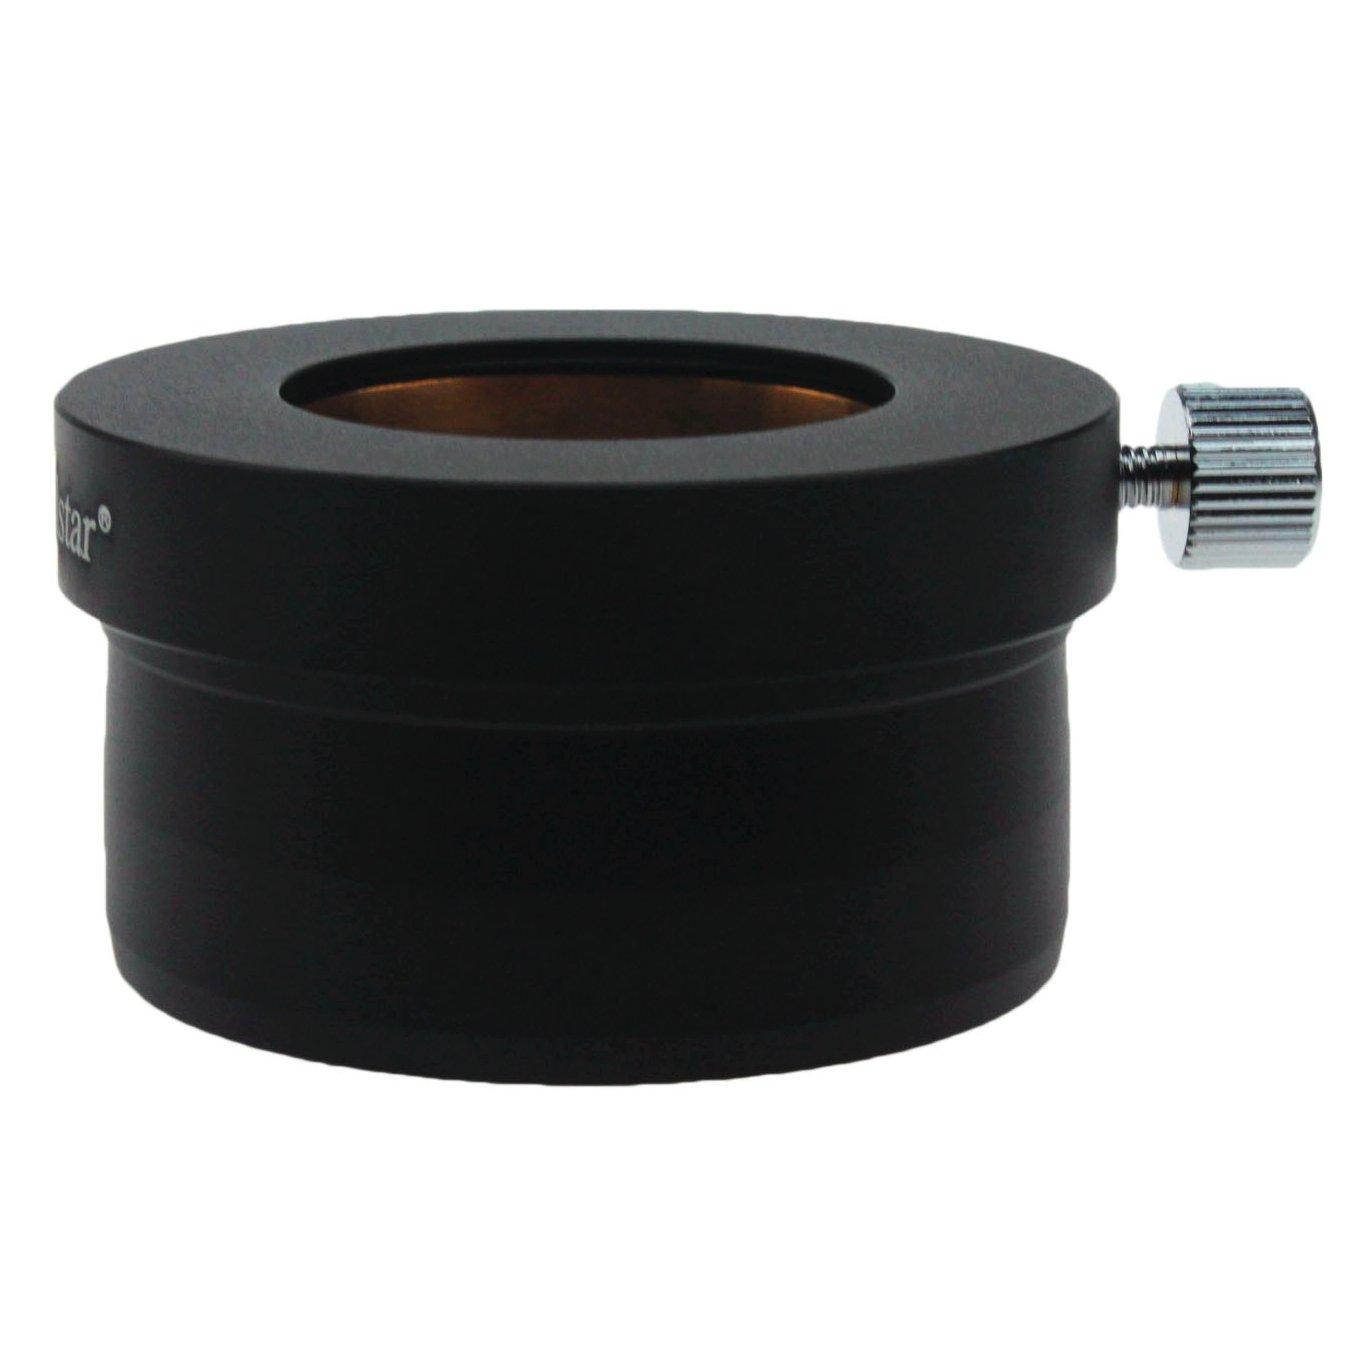 Alstar 2 to 1.25 Telescope Eyepiece Adapter